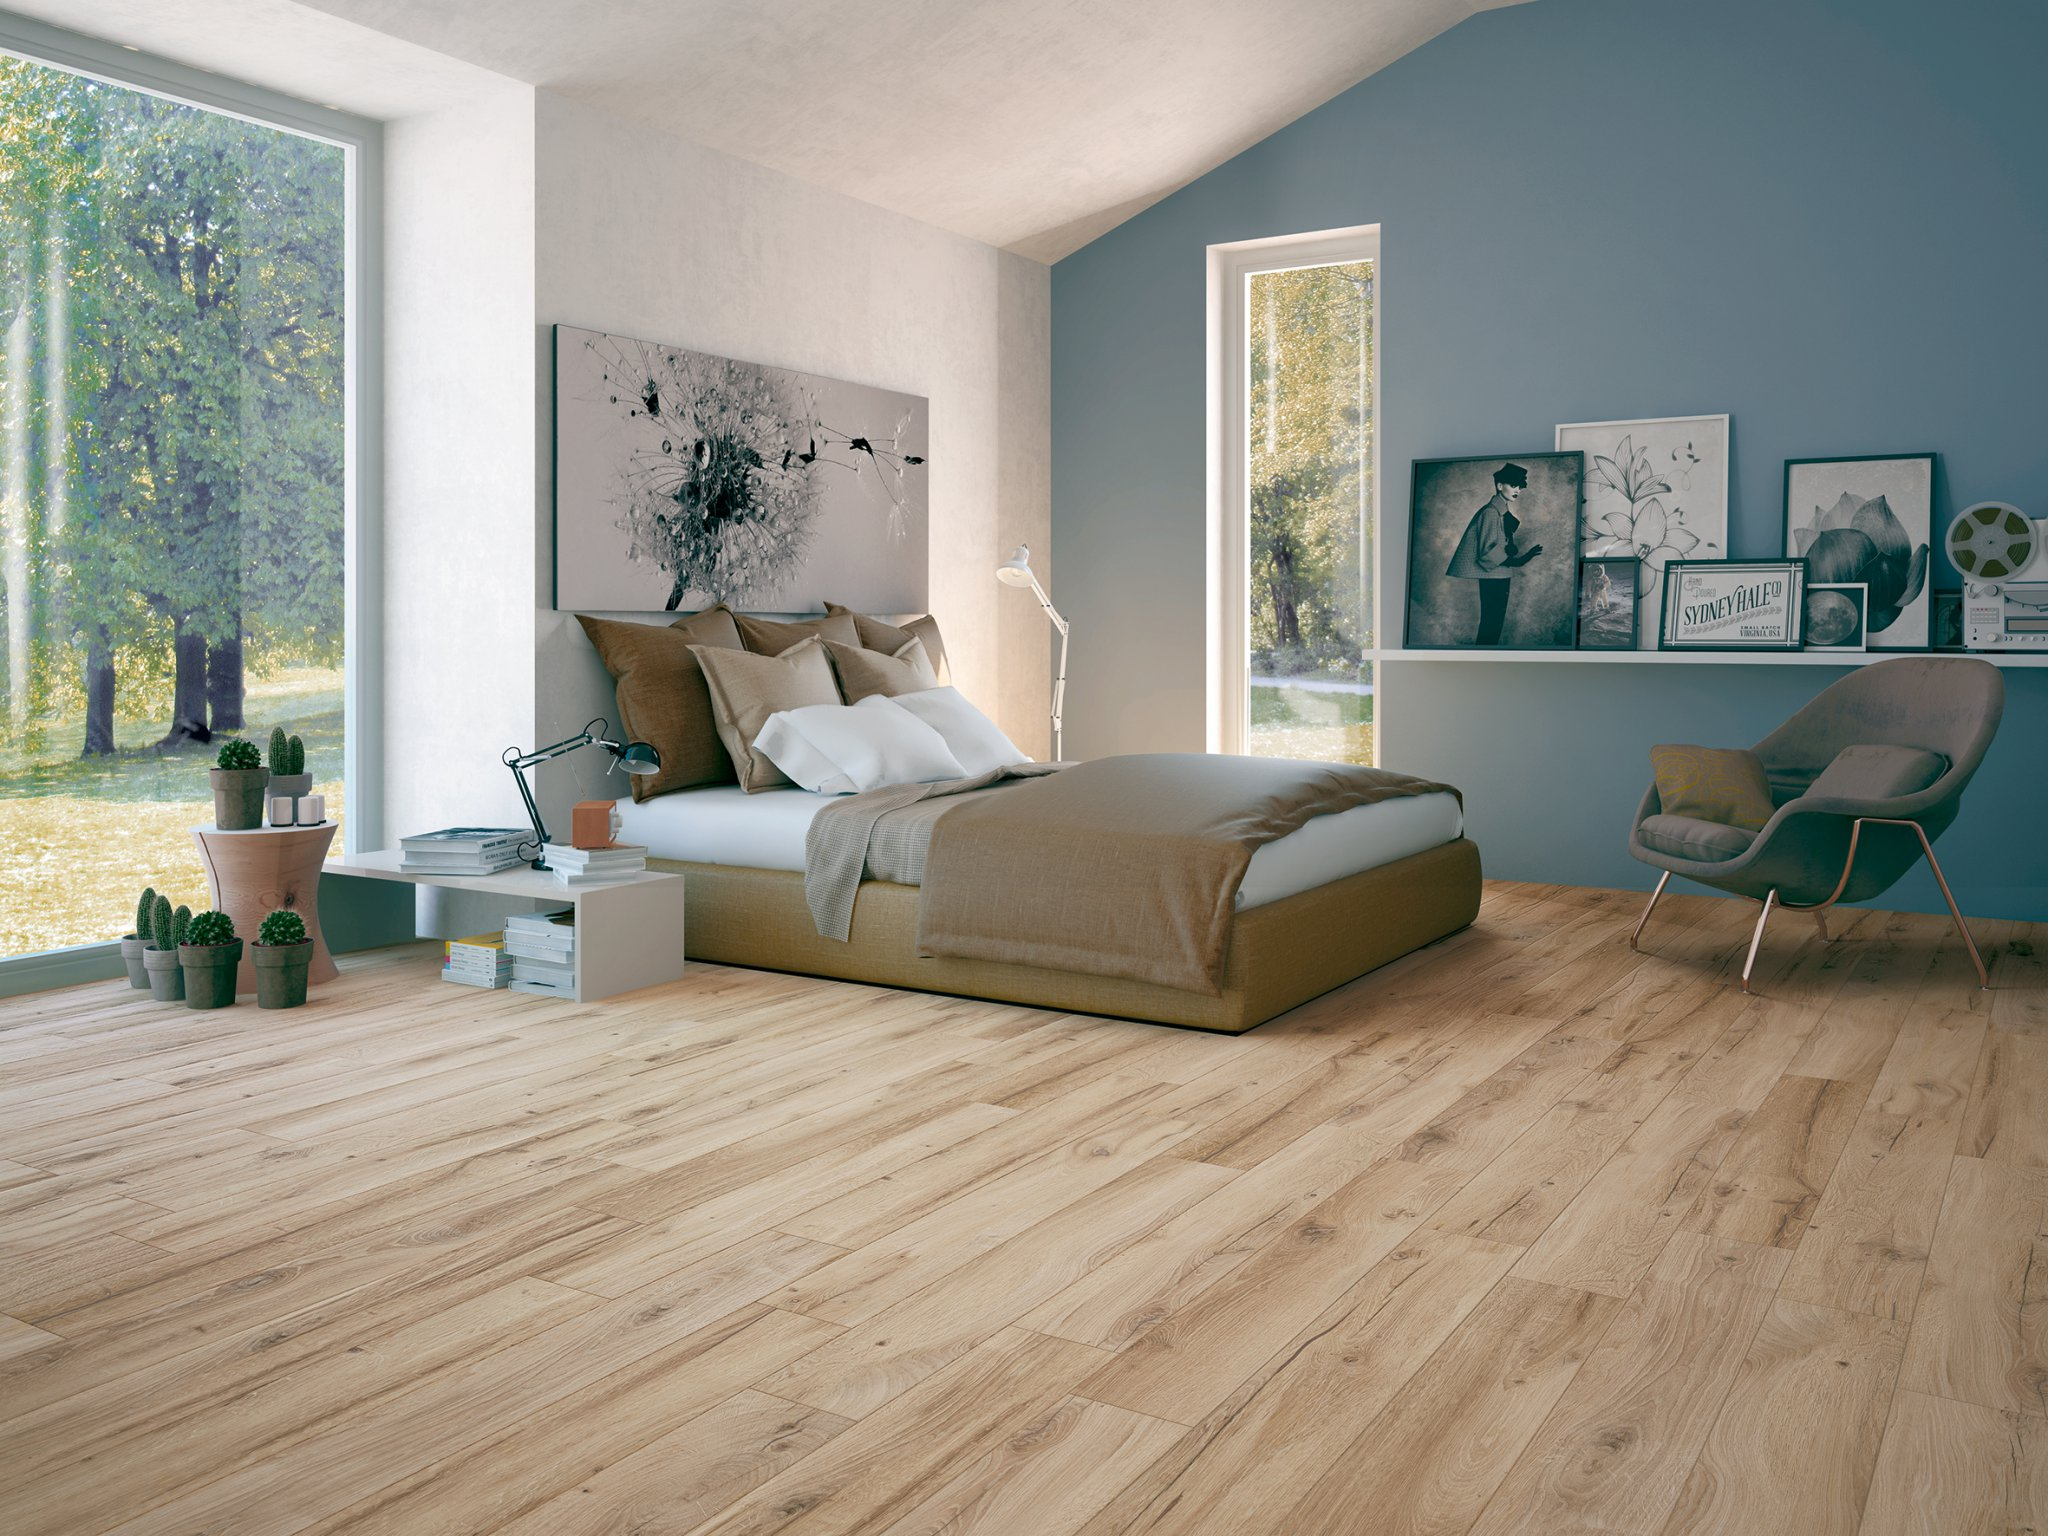 serie briccola pavimenti e rivestimenti armonie by arte casa. Black Bedroom Furniture Sets. Home Design Ideas